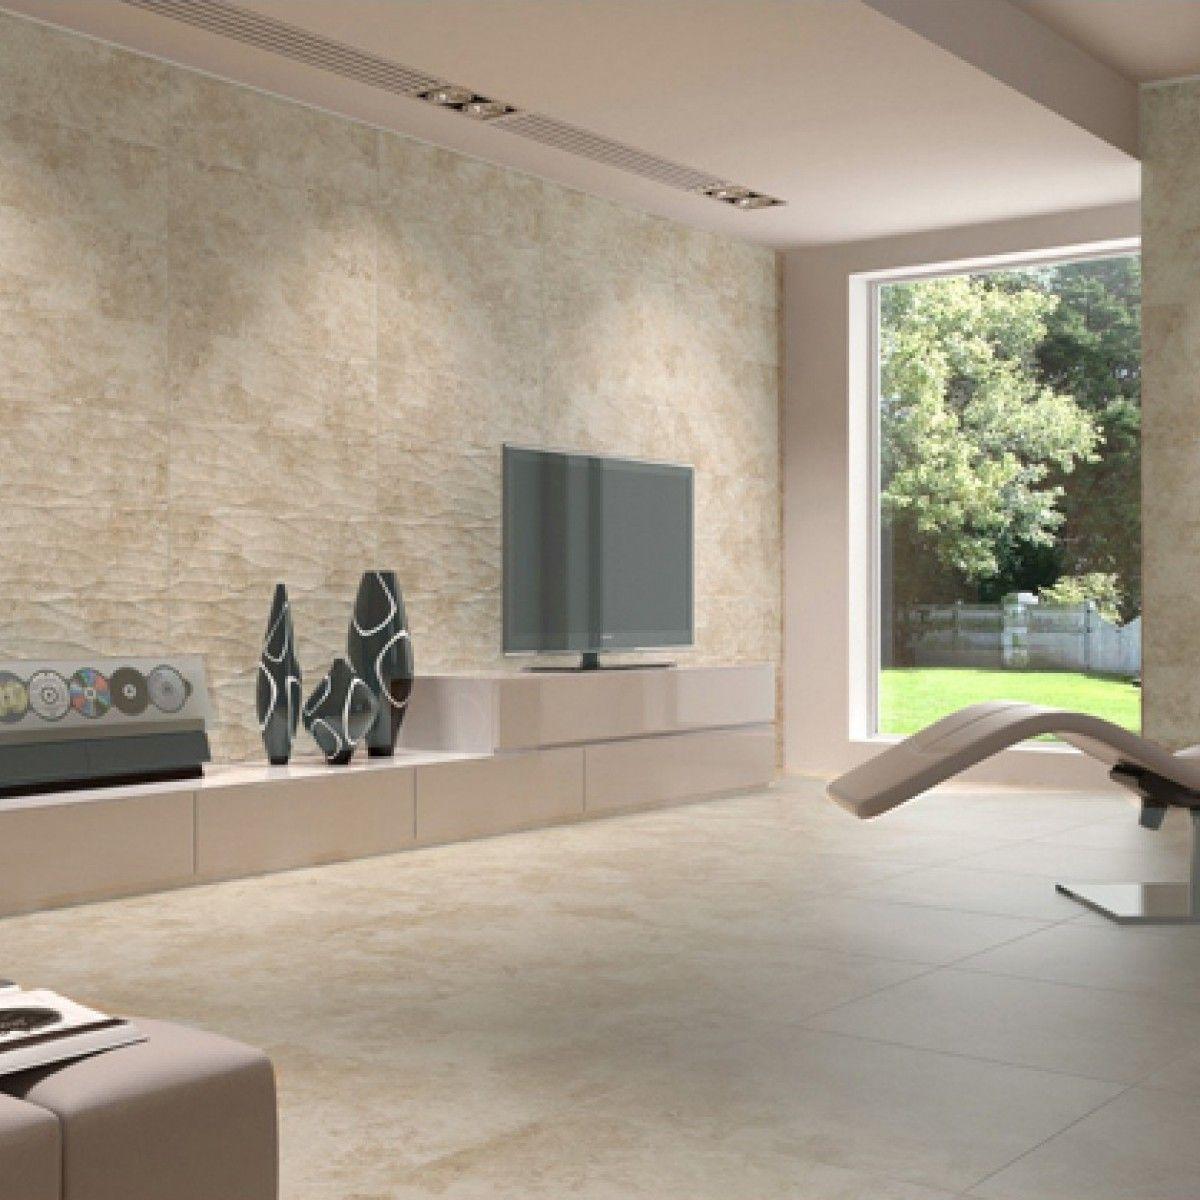 Tivoli Marfil - 450mm x 450mm | Floor Tiles | Pinterest | Tiles ...